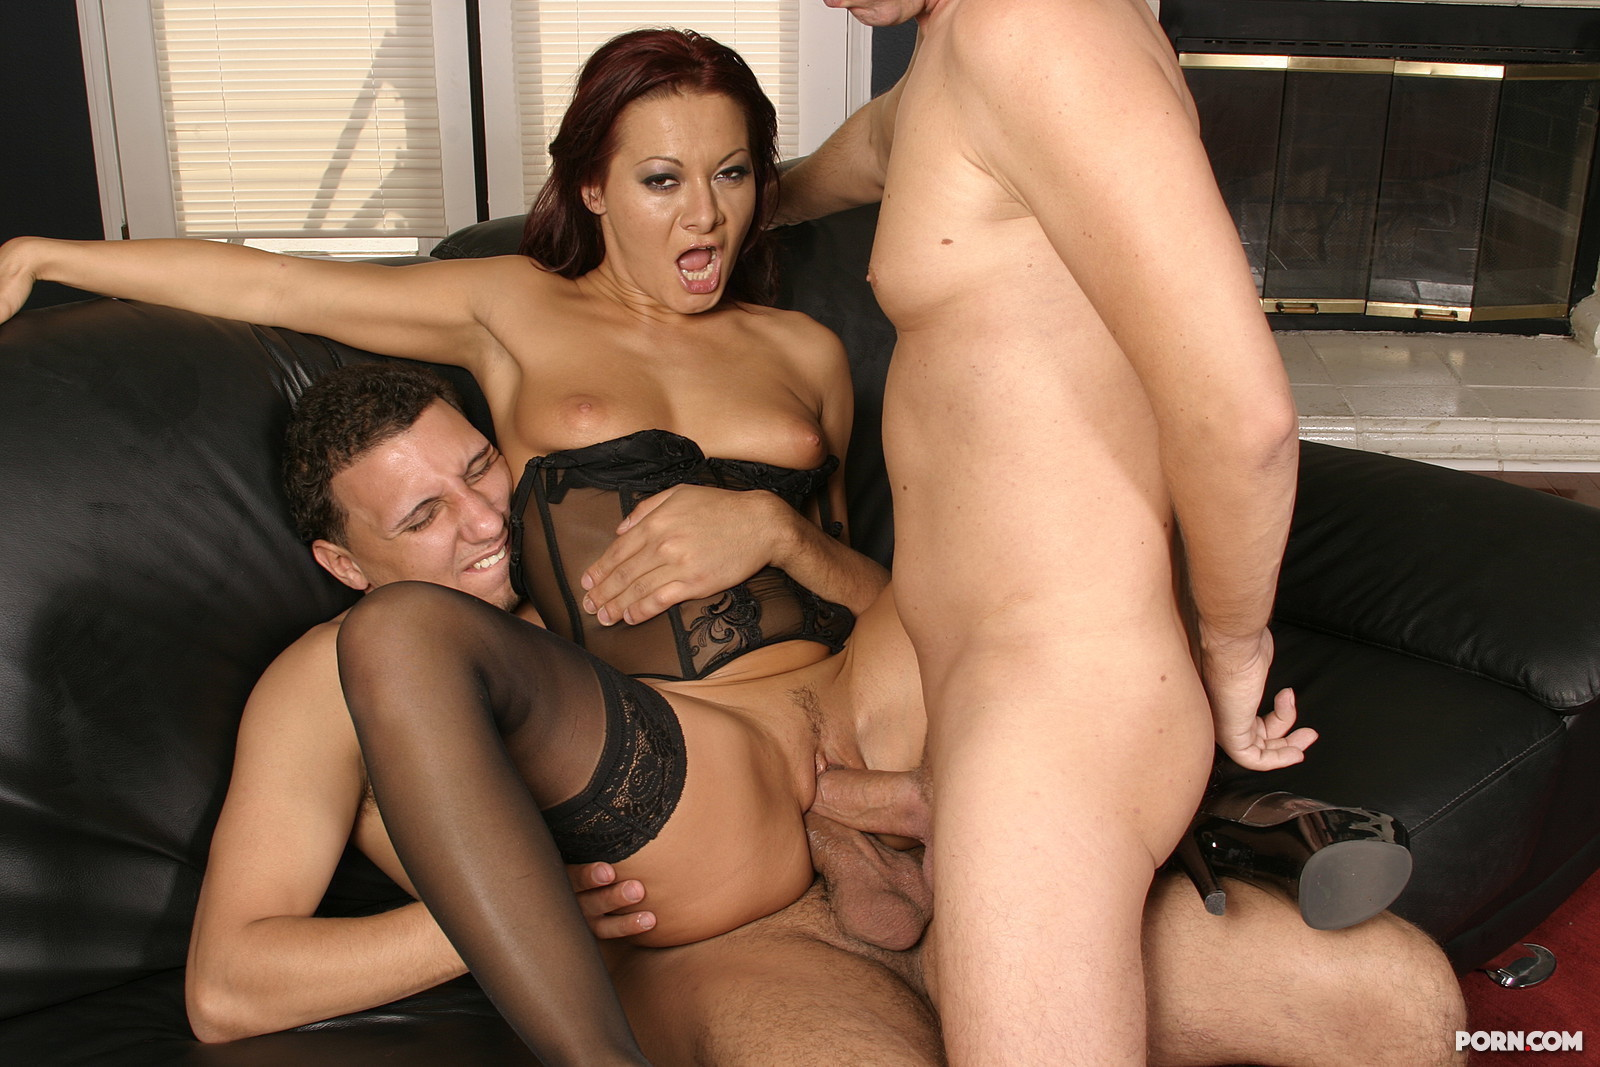 Фото жена изменяет мужу с двумя